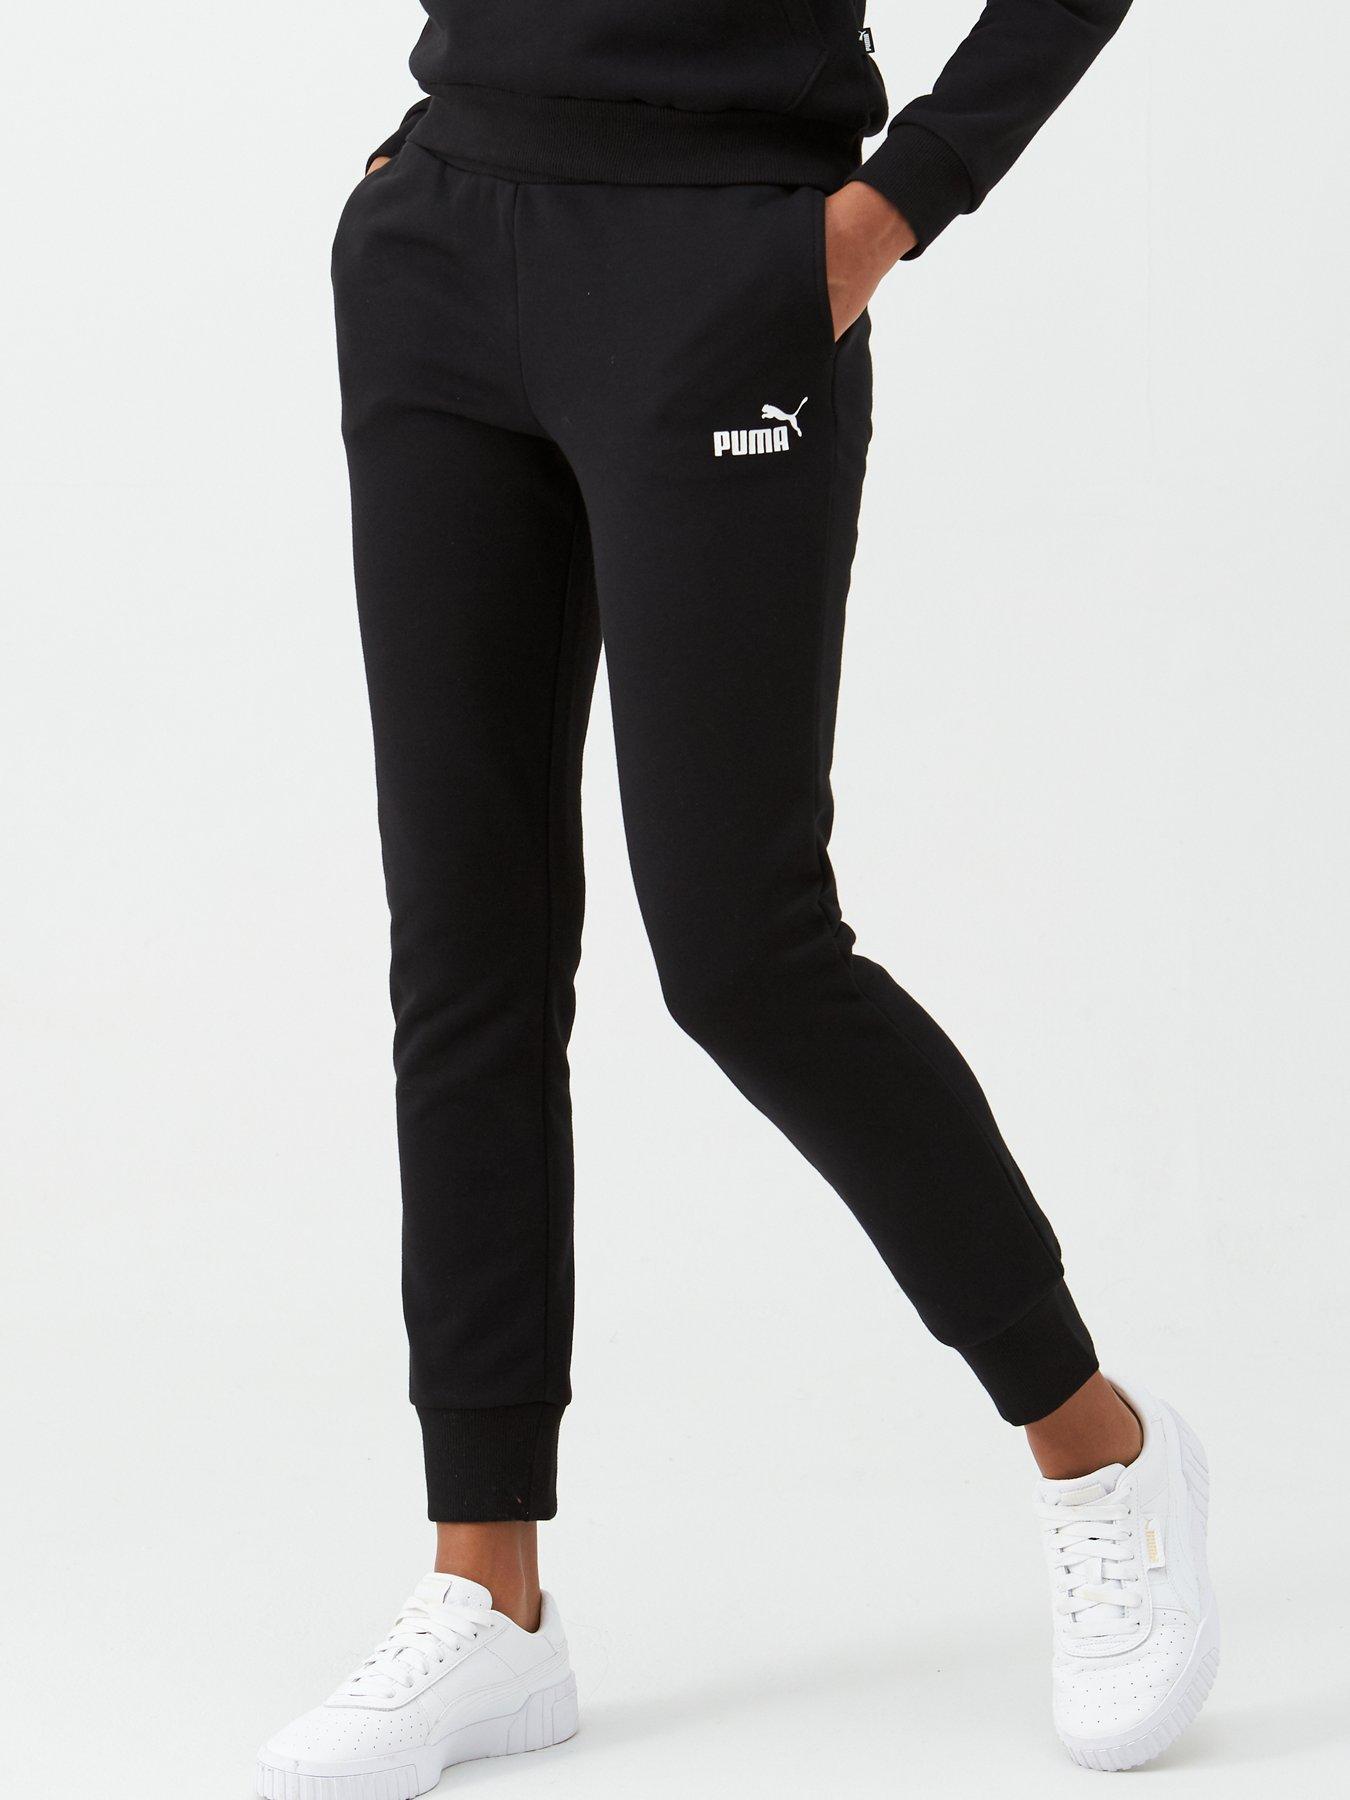 Puma   Jogging bottoms   Sportswear